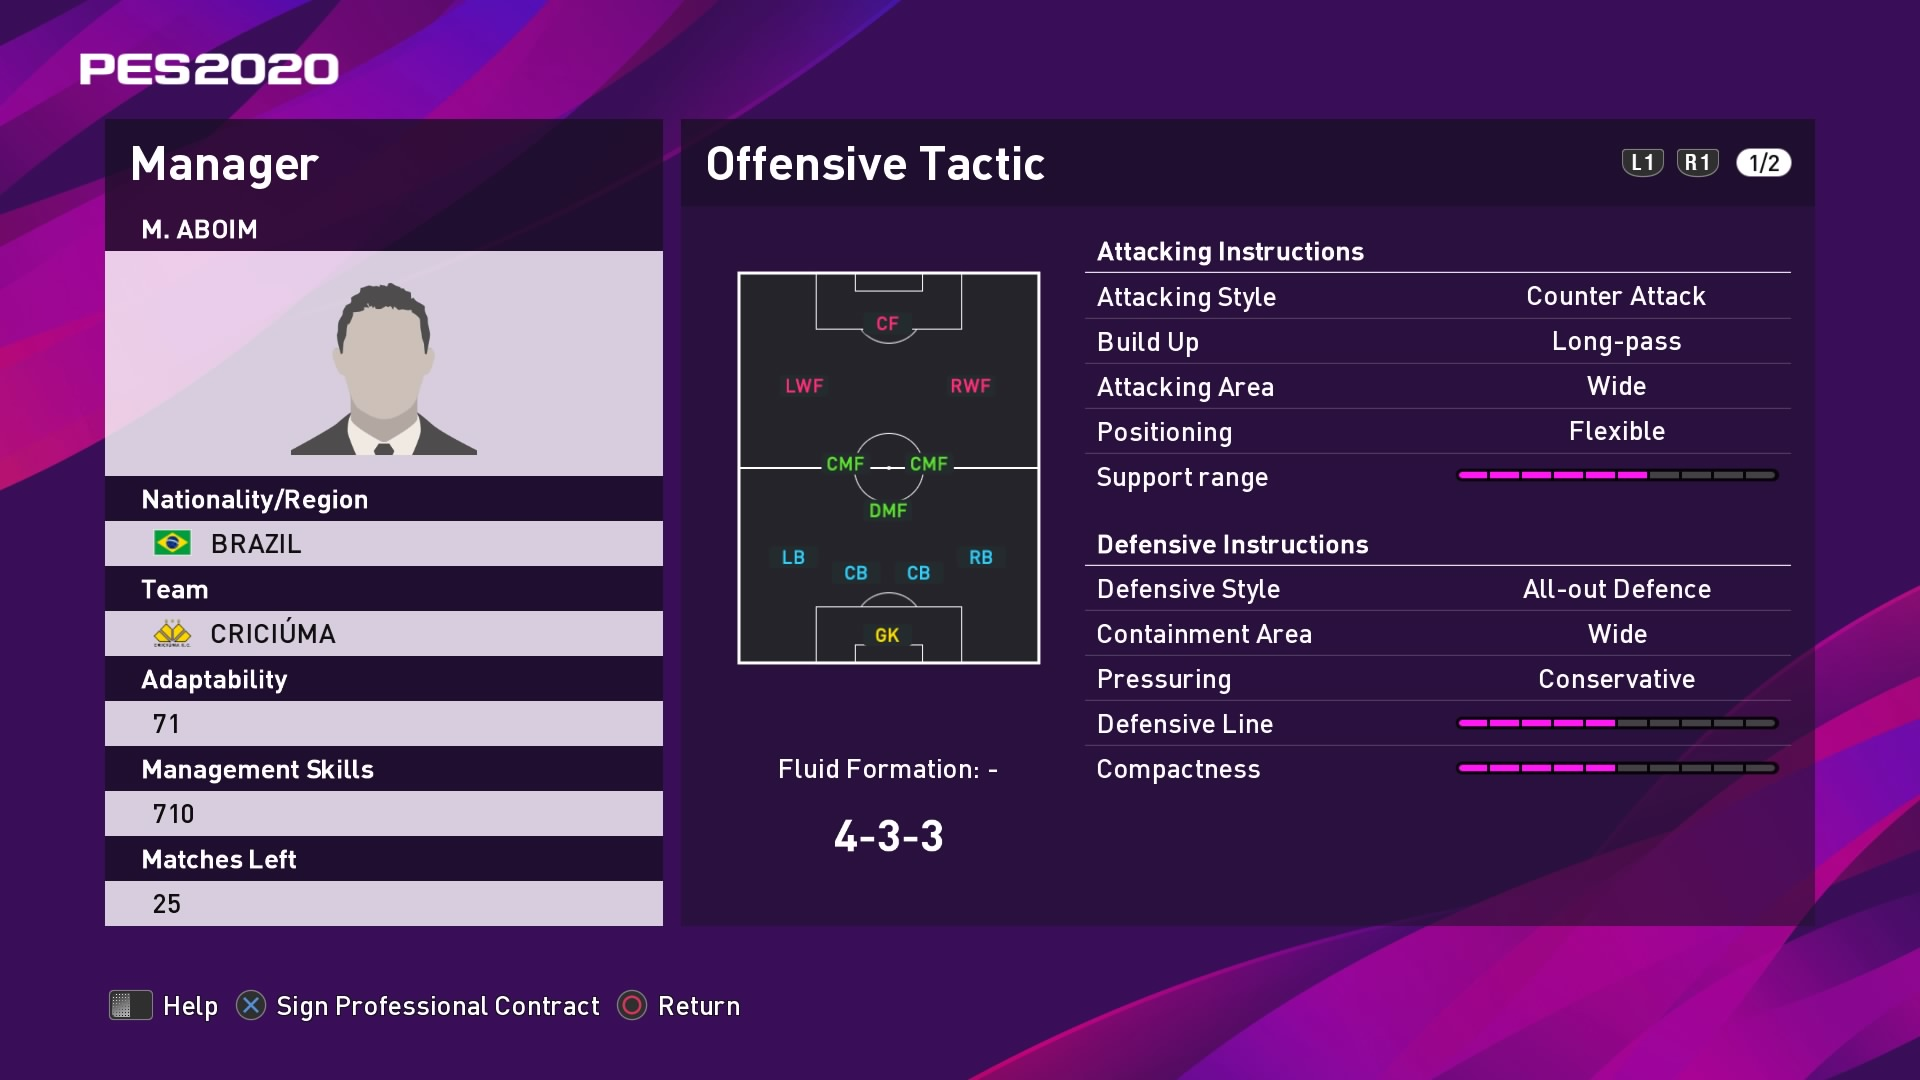 M. Aboim (Roberto Cavalo) Offensive Tactic in PES 2020 myClub